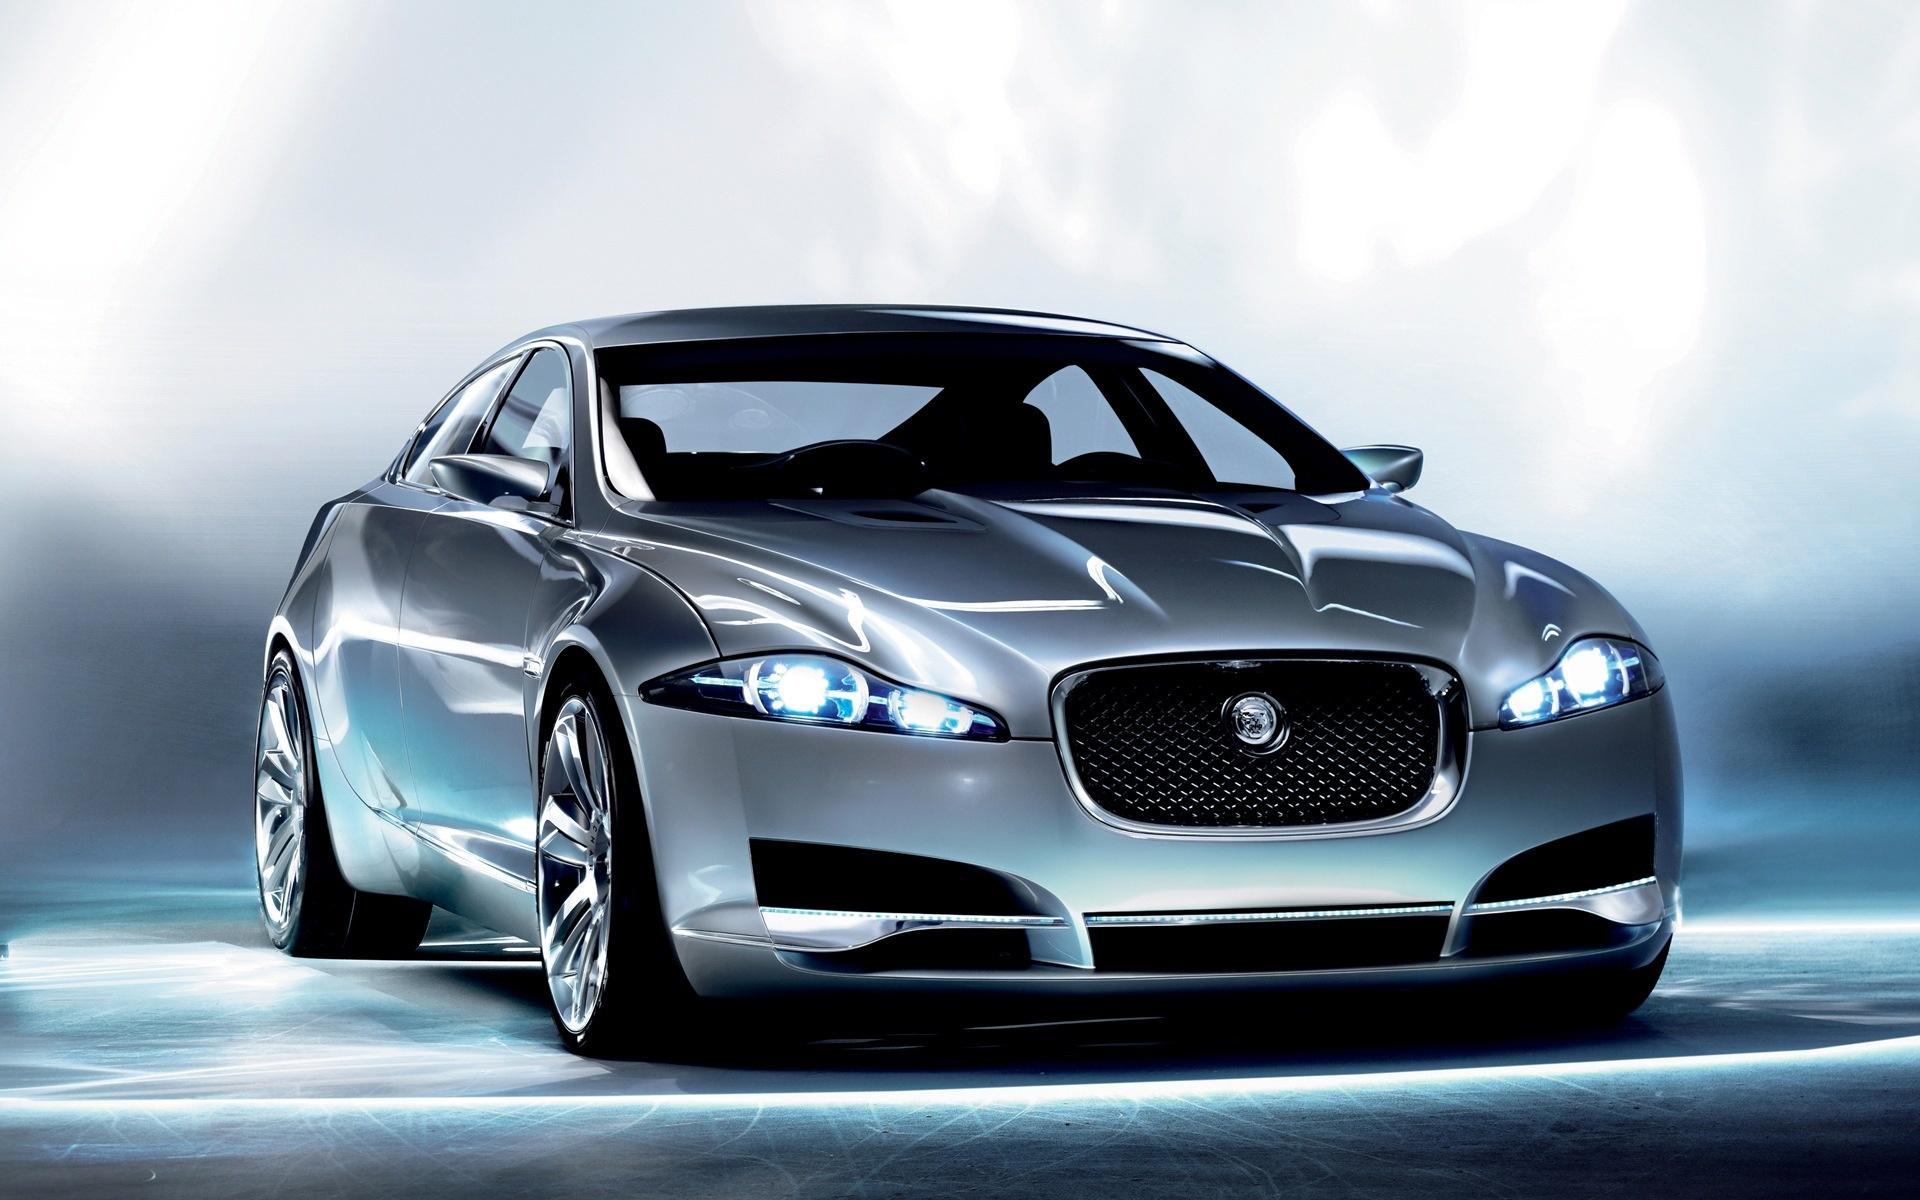 Awesome Jaguar XF Wallpaper